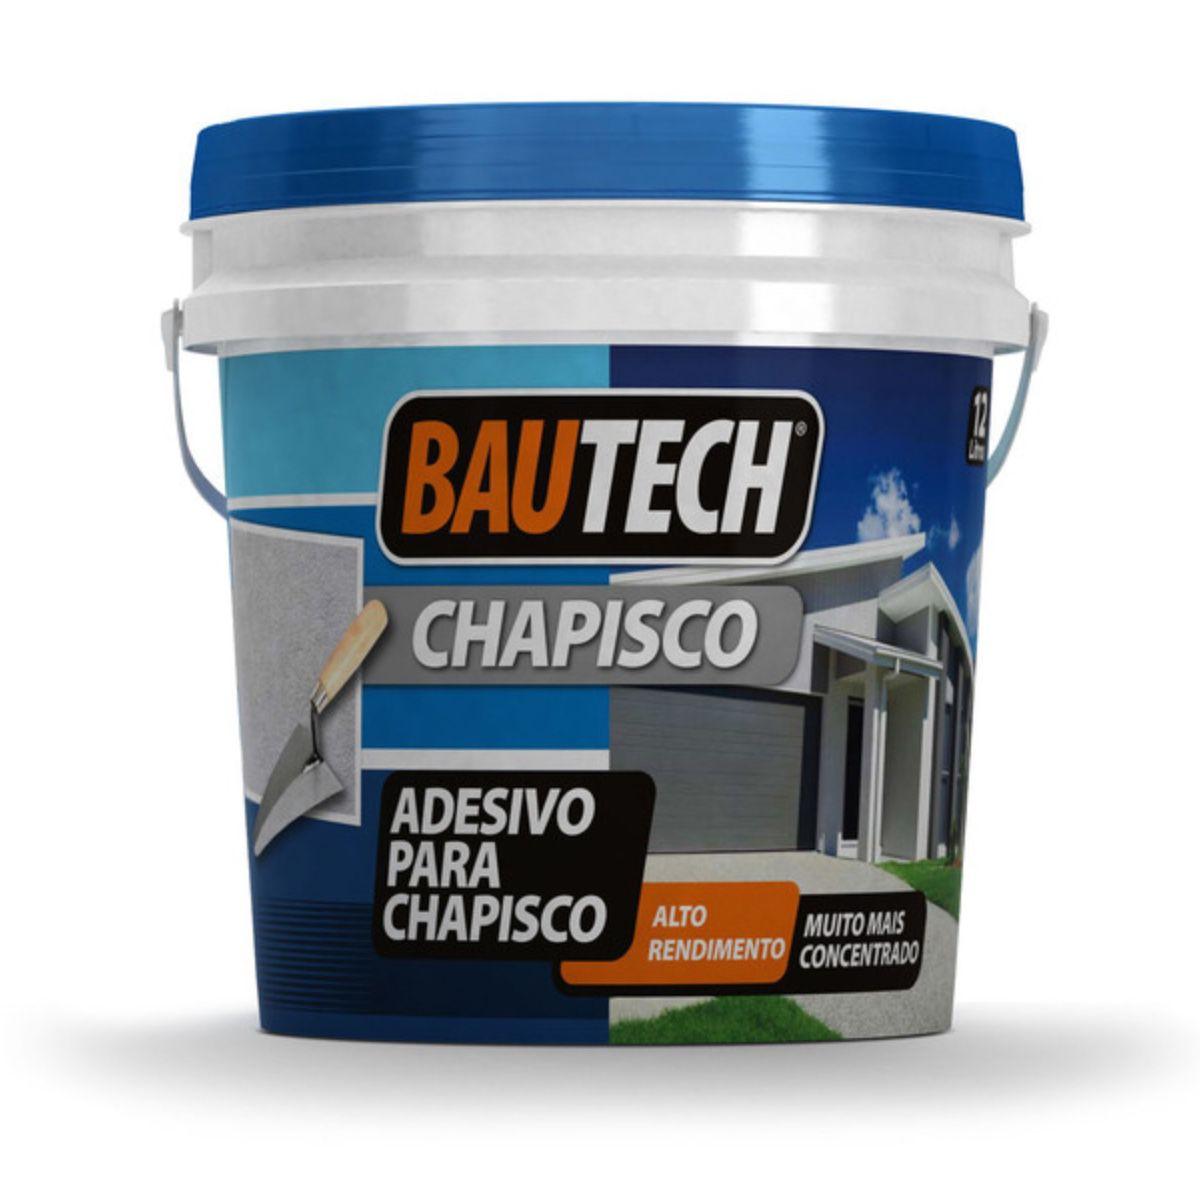 Bautech Chapisco 500 - 12l